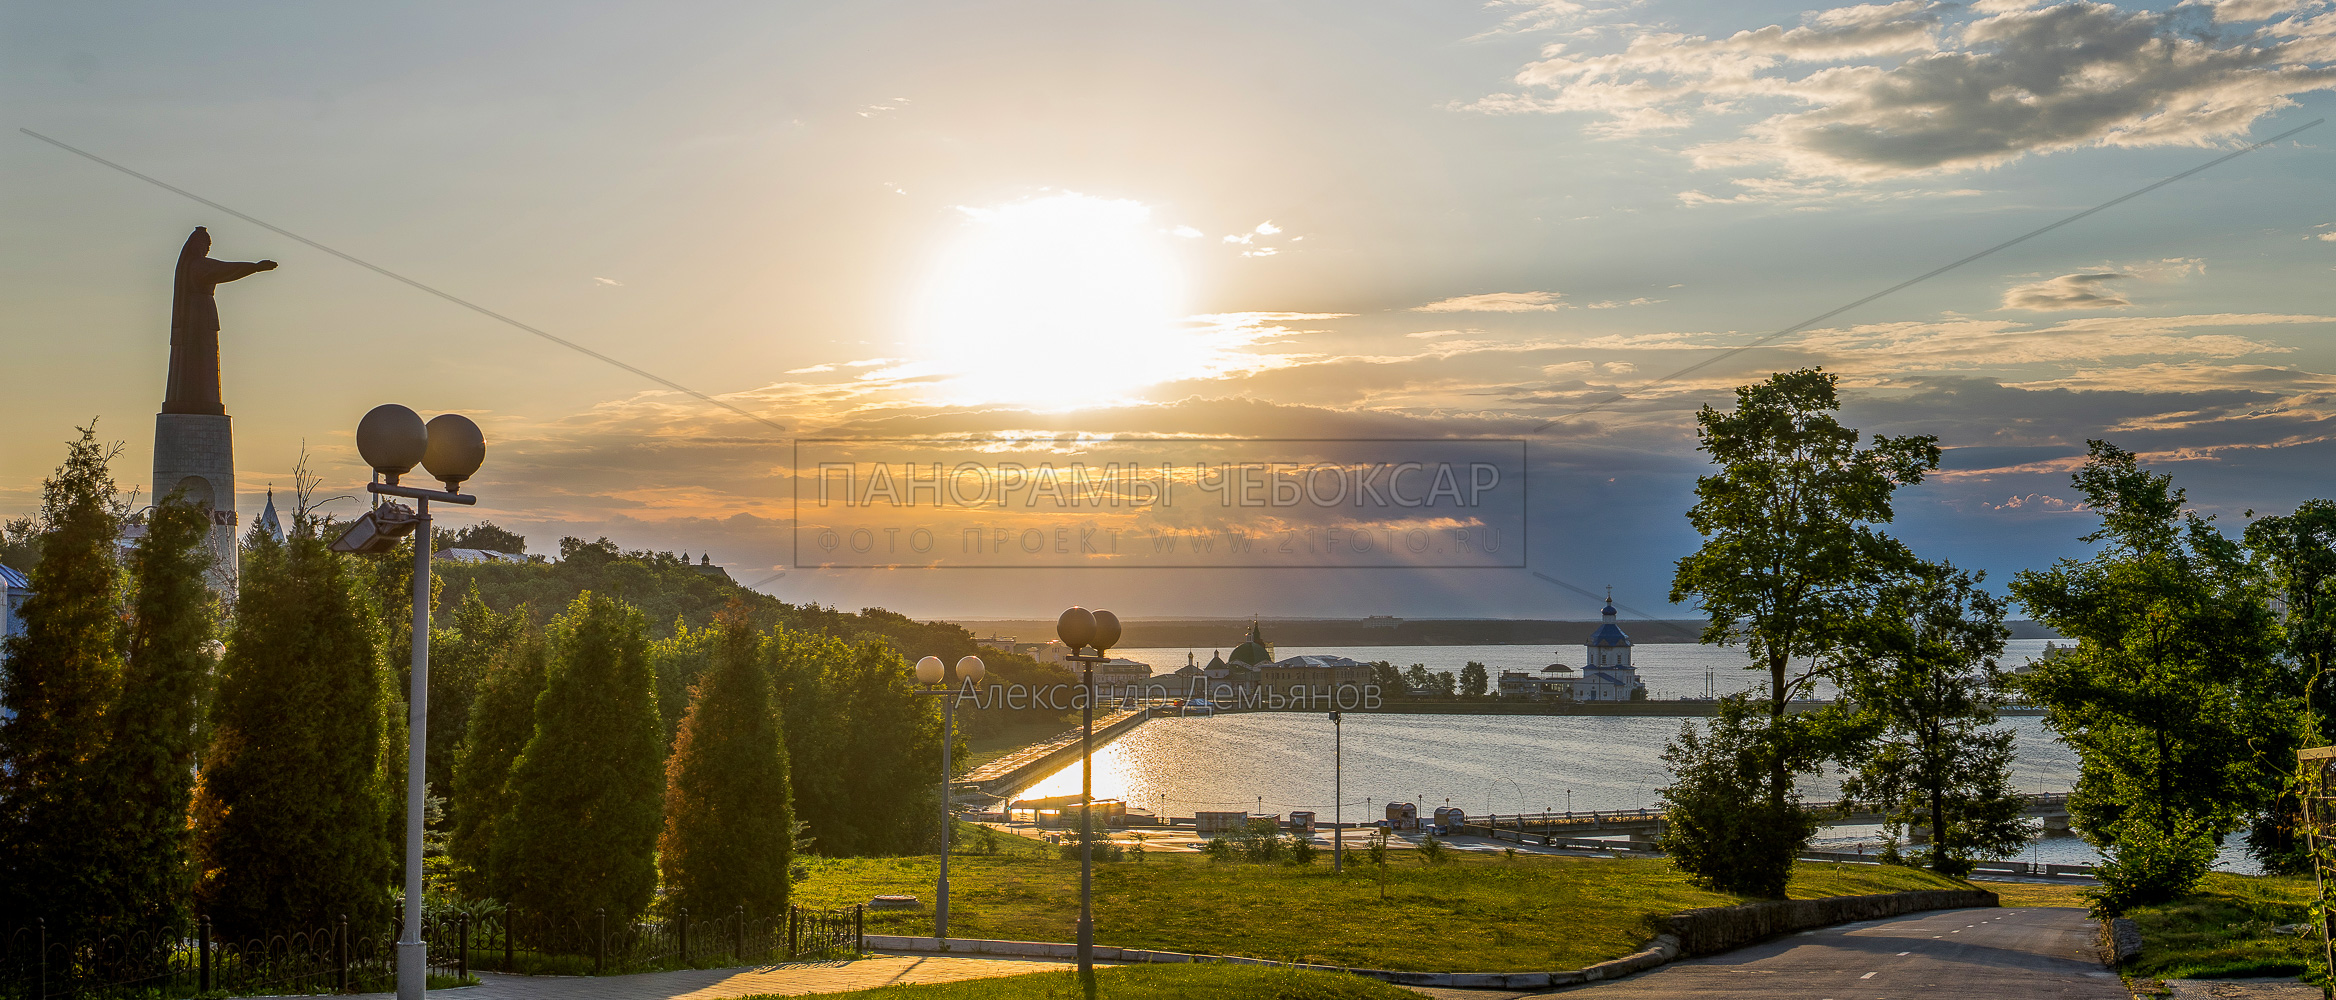 Рассвет над Чебоксарским заливом 2015